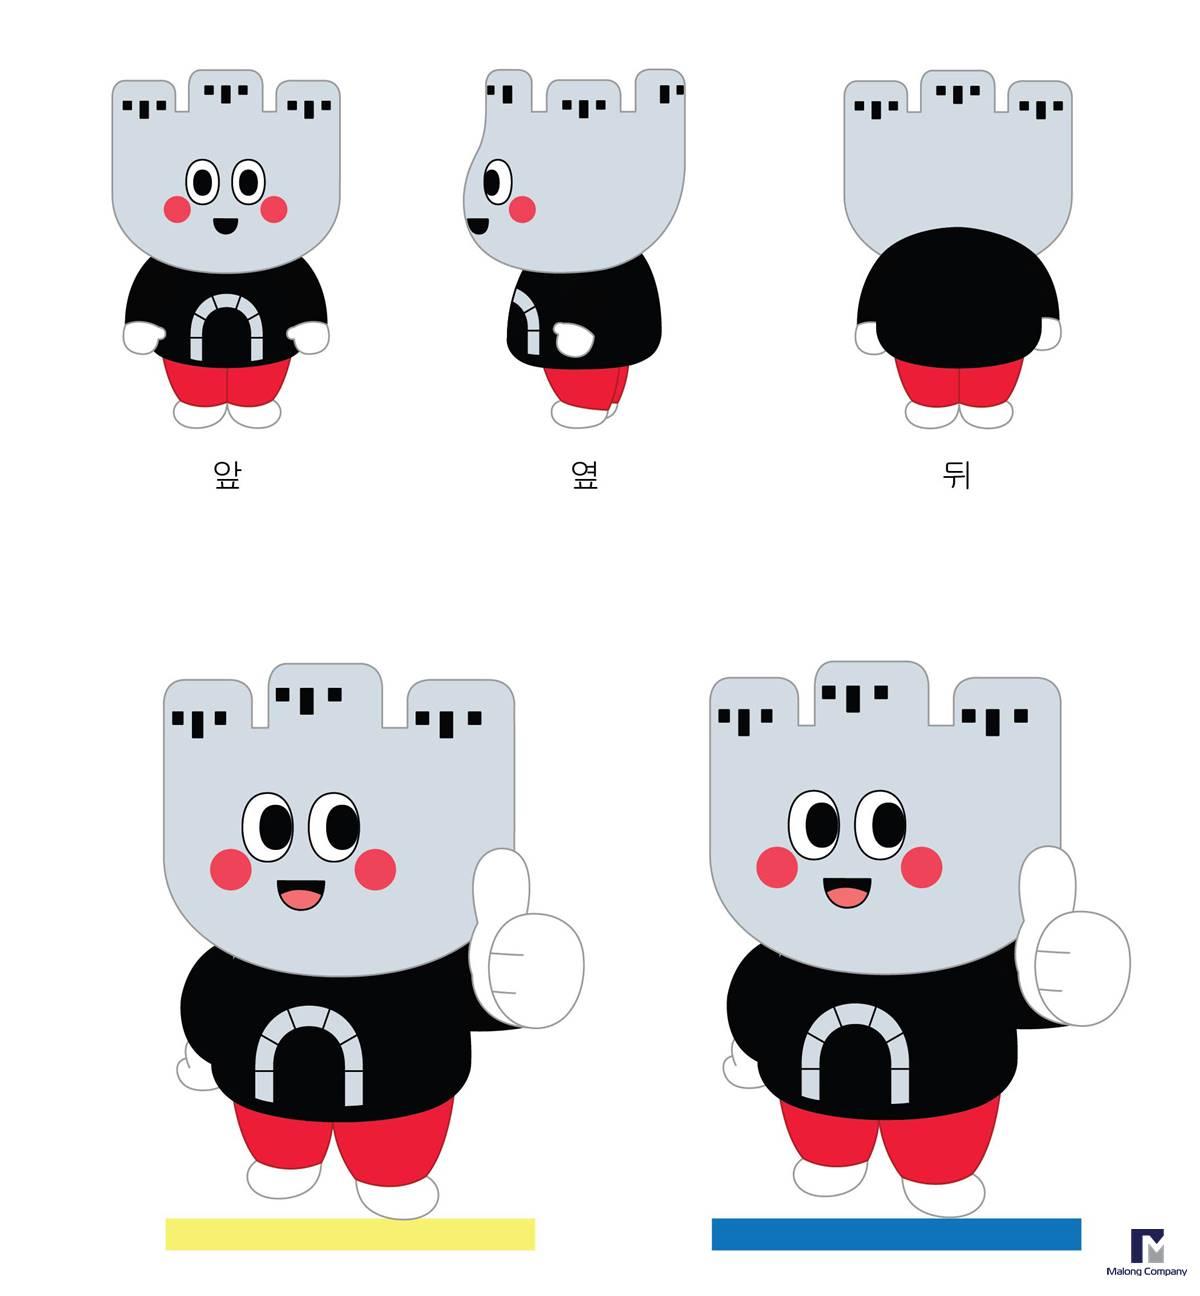 [FRP 캐릭터 조형물] 광주시 관광캐릭터 깡두리 모형 제작